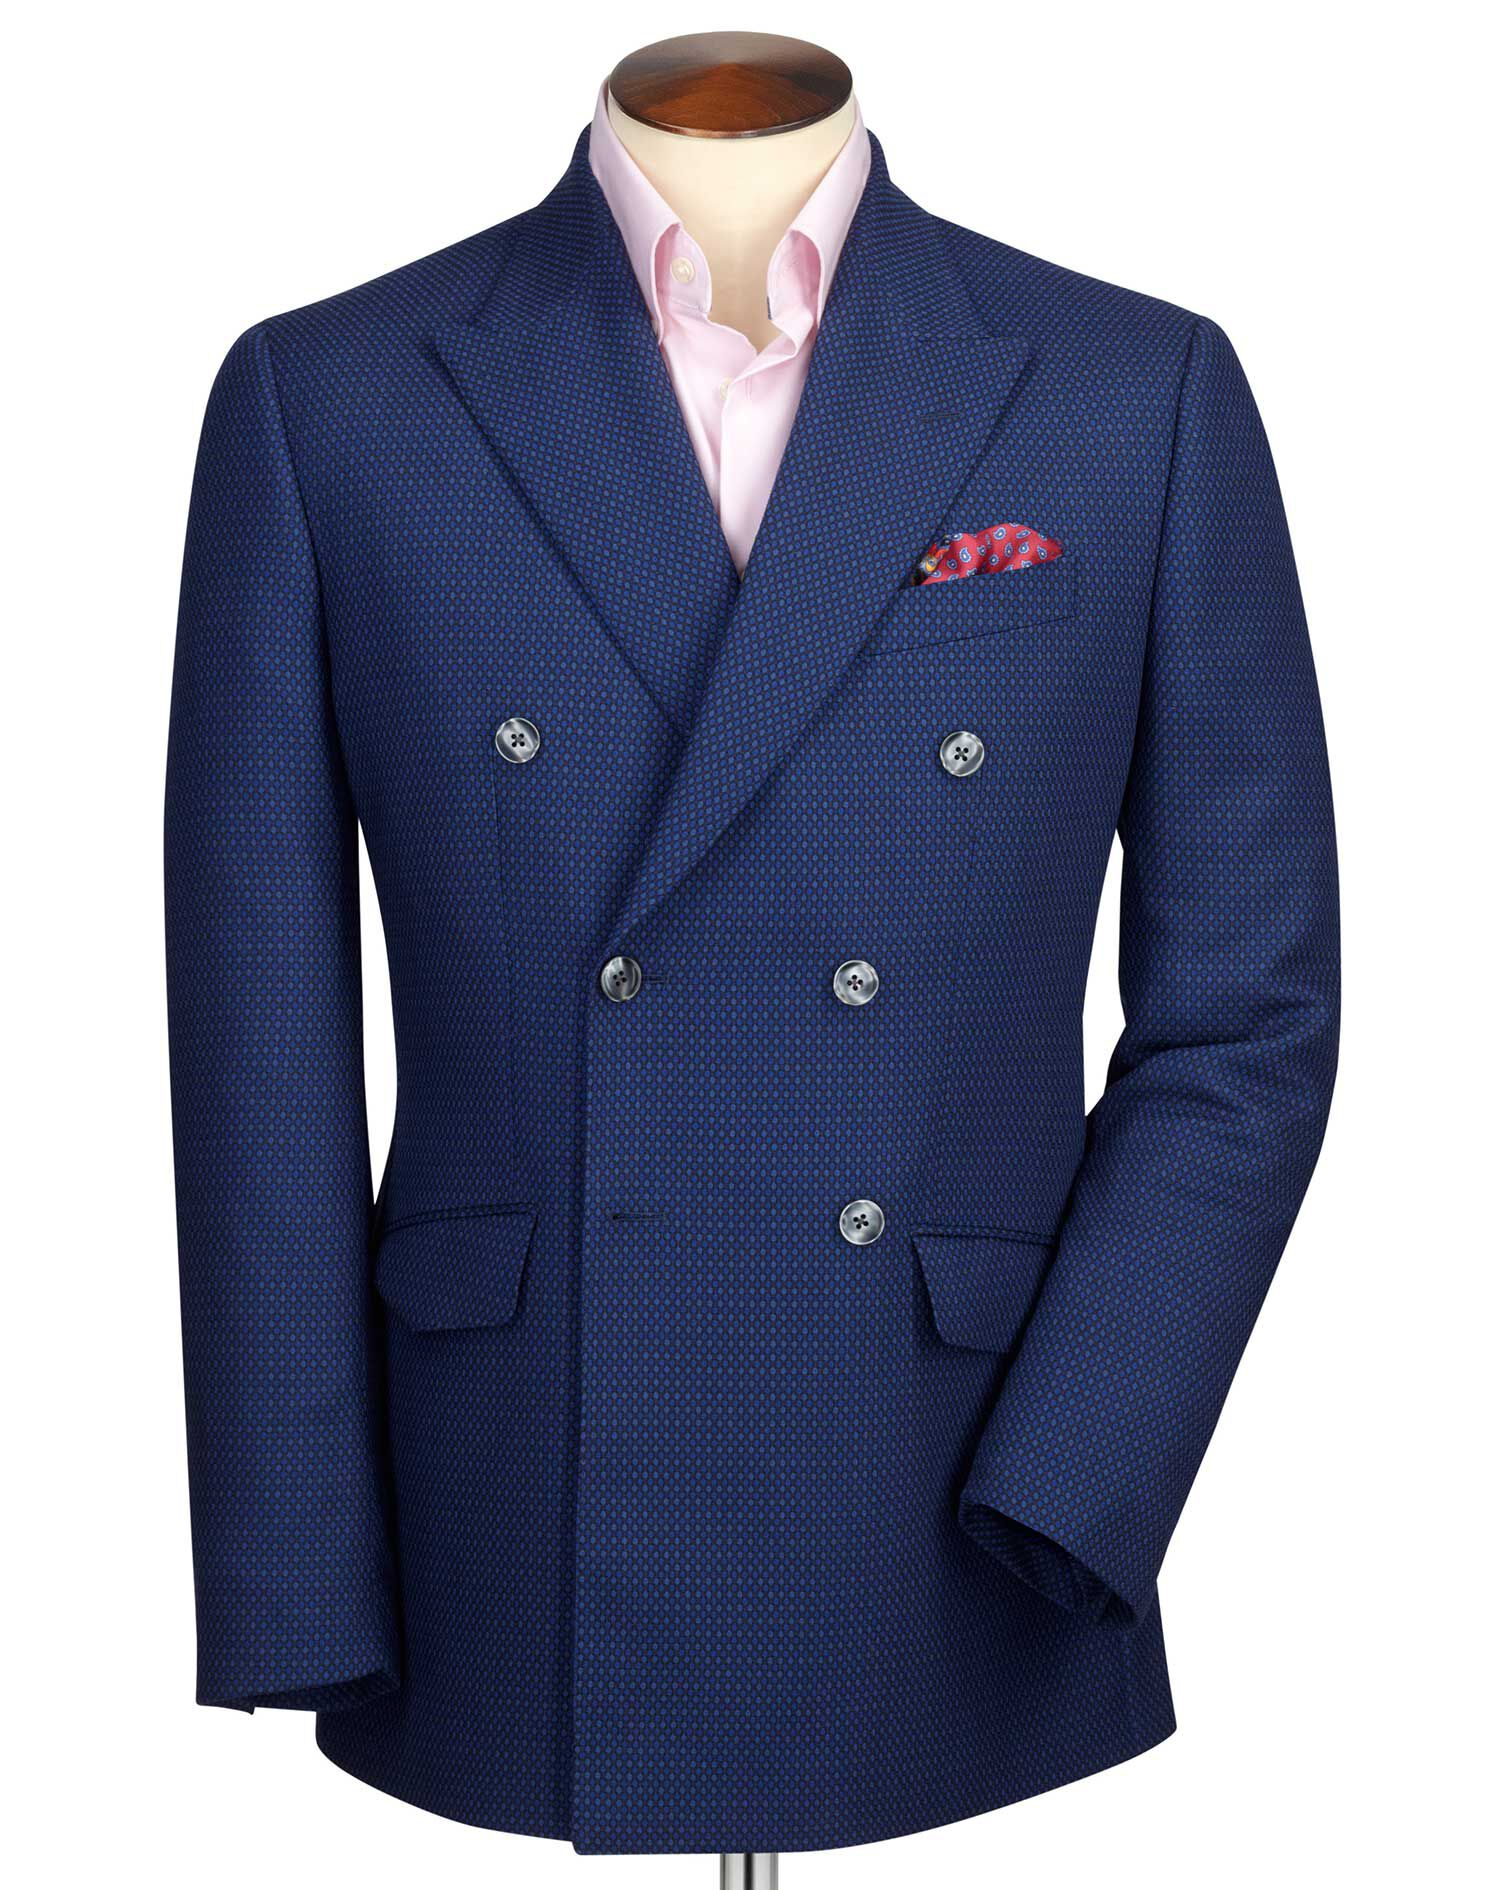 Slim Fit Royal Blue Double Breasted Birdseye Wool Wool Jacket Size 42 Short by Charles Tyrwhitt